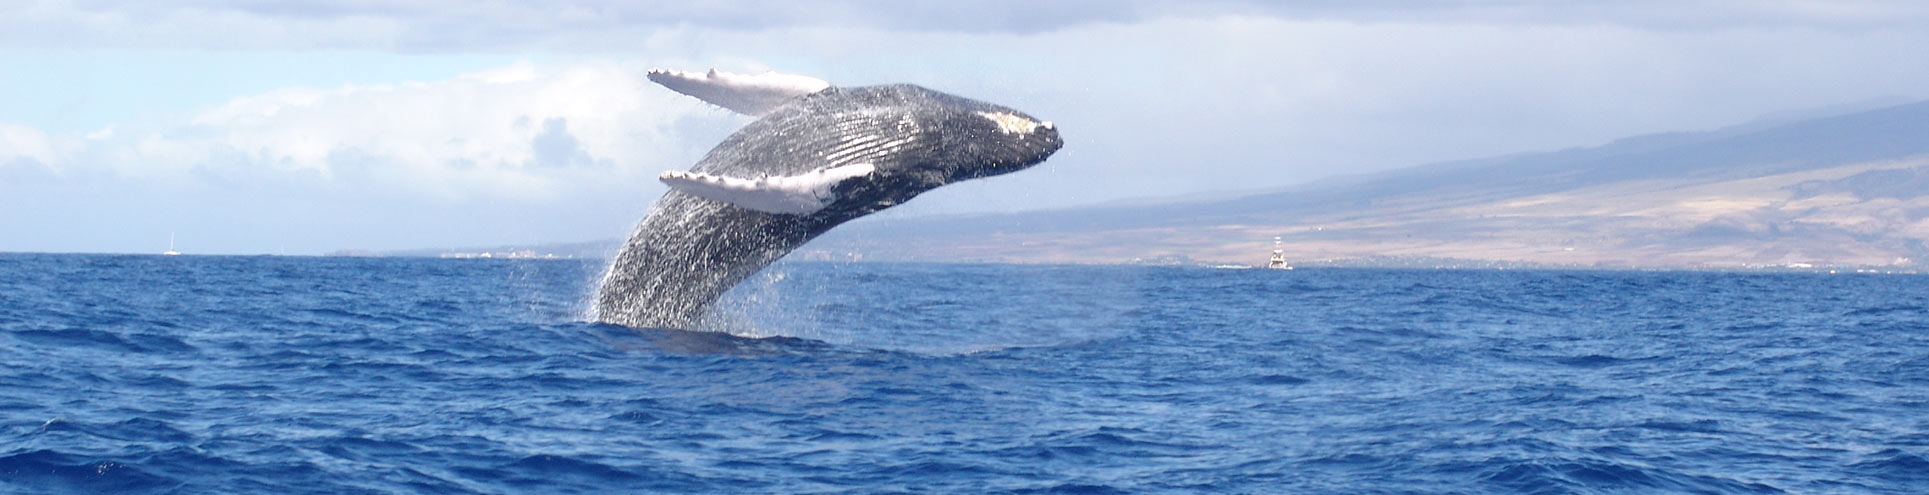 Watch the Humpbacks Breach